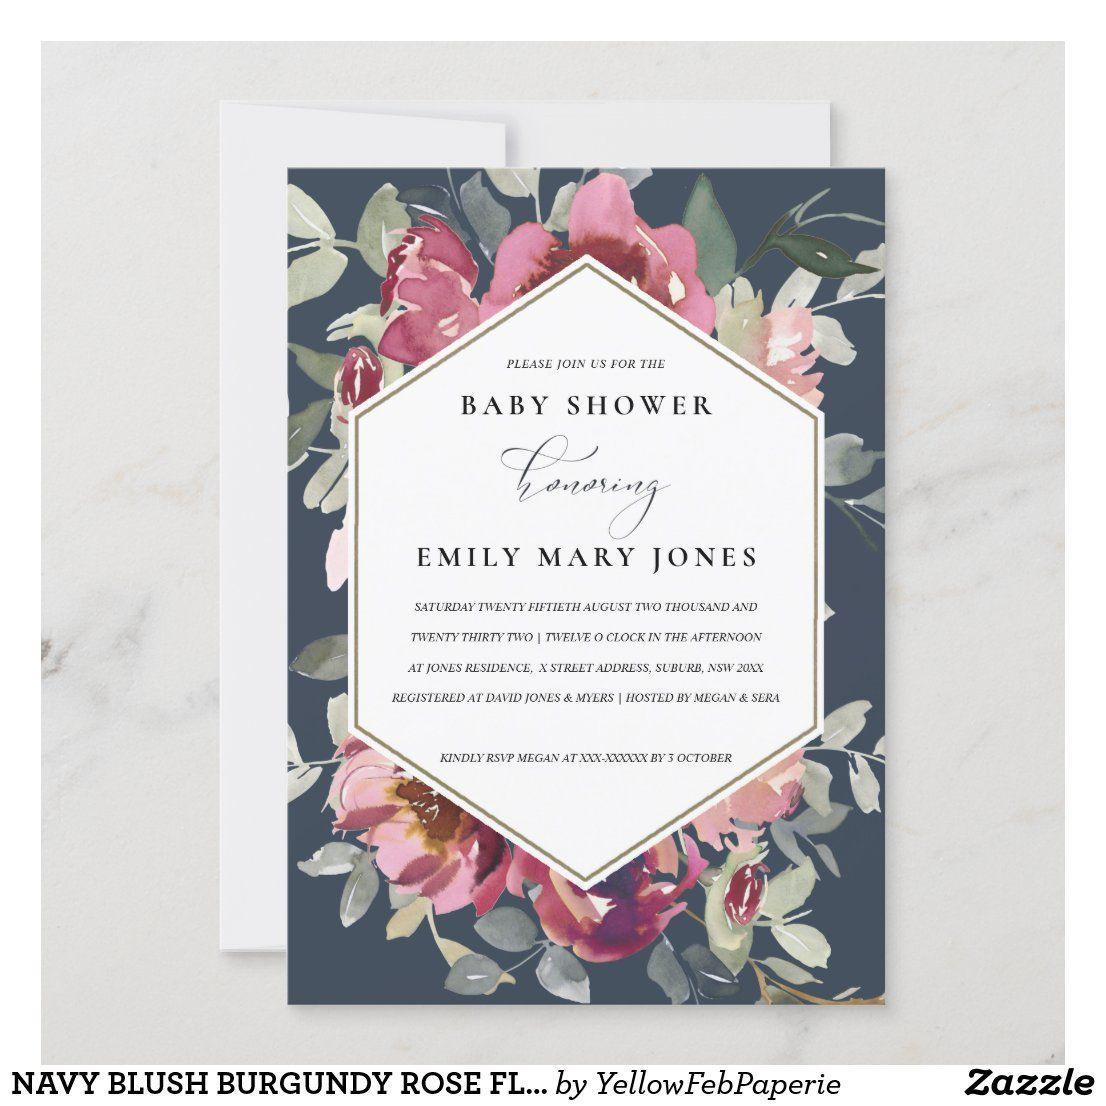 NAVY BLUSH BURGUNDY ROSE FLORA BABY SHOWER INVITE | Zazzle.com in 2020 |  Bridal shower invitations, Rustic bridal shower invitations, Floral wedding  invitations